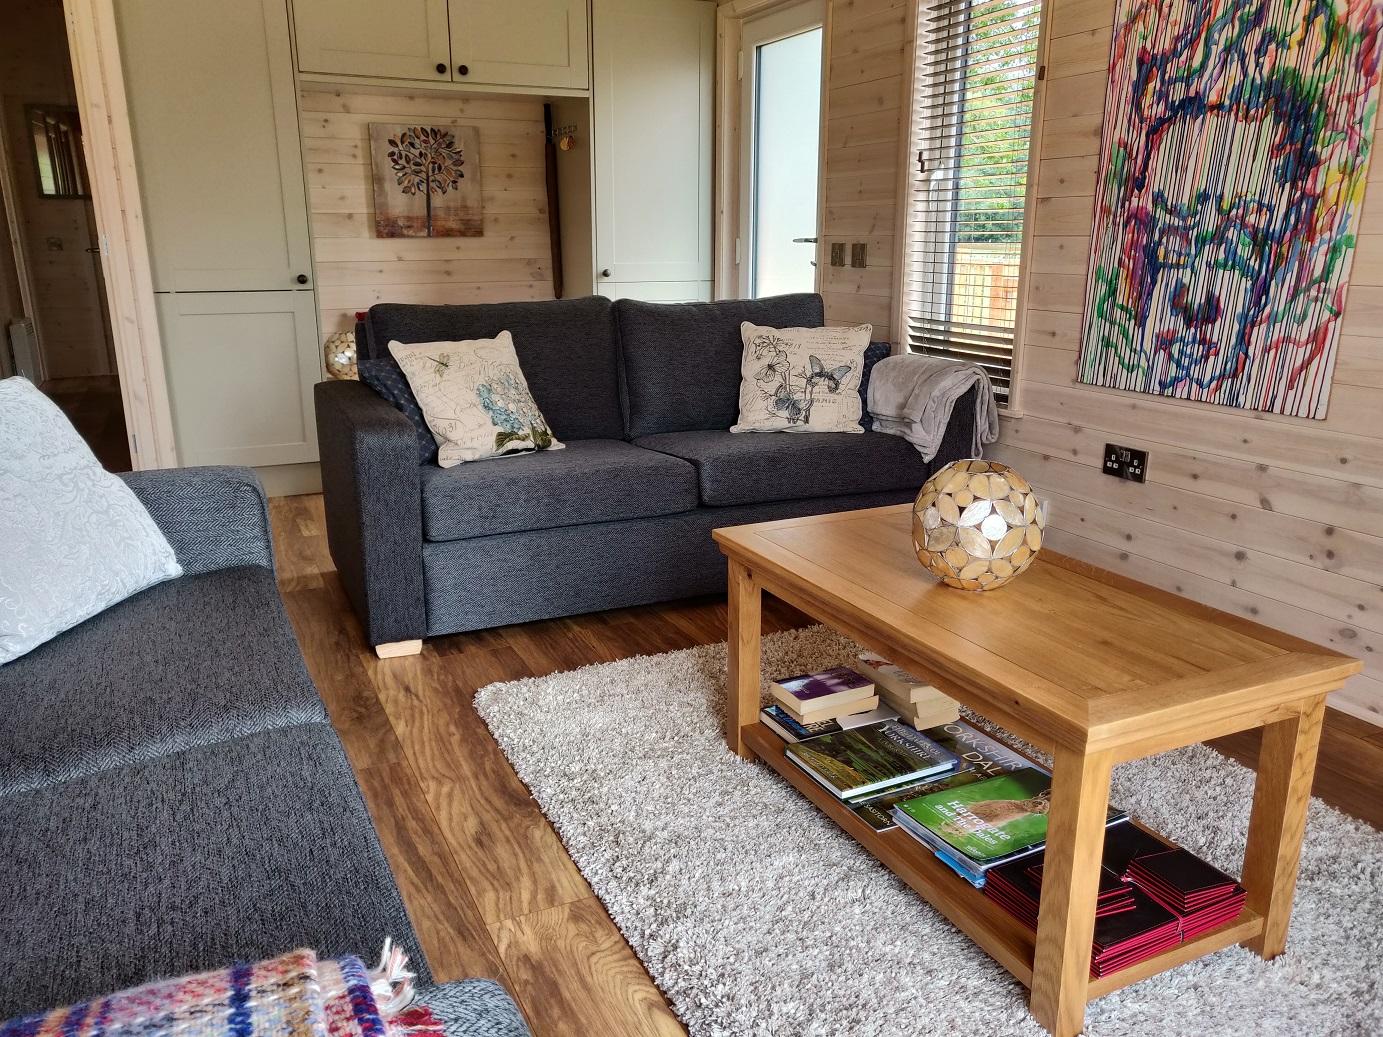 sofa and art.jpg